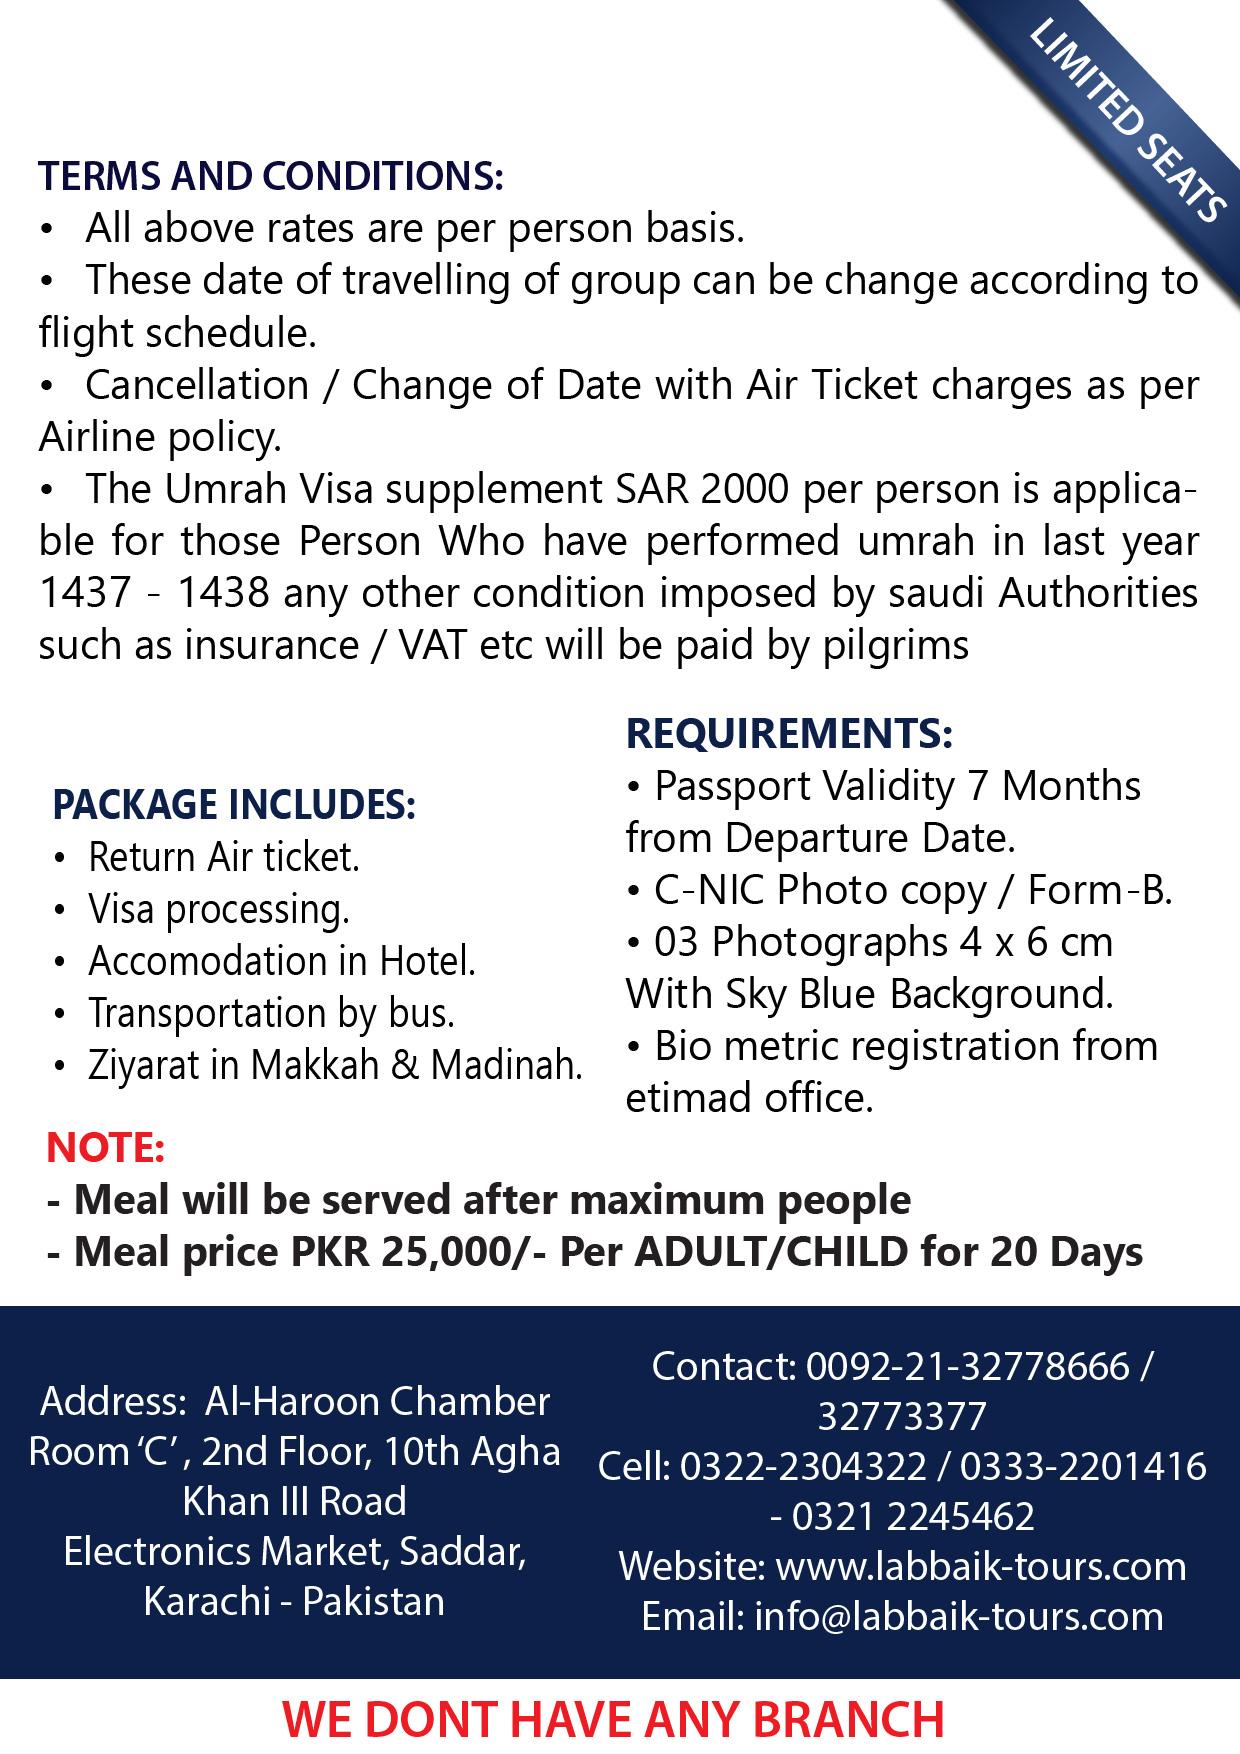 Labbaik Tours & Travels (Pvt ) Ltd